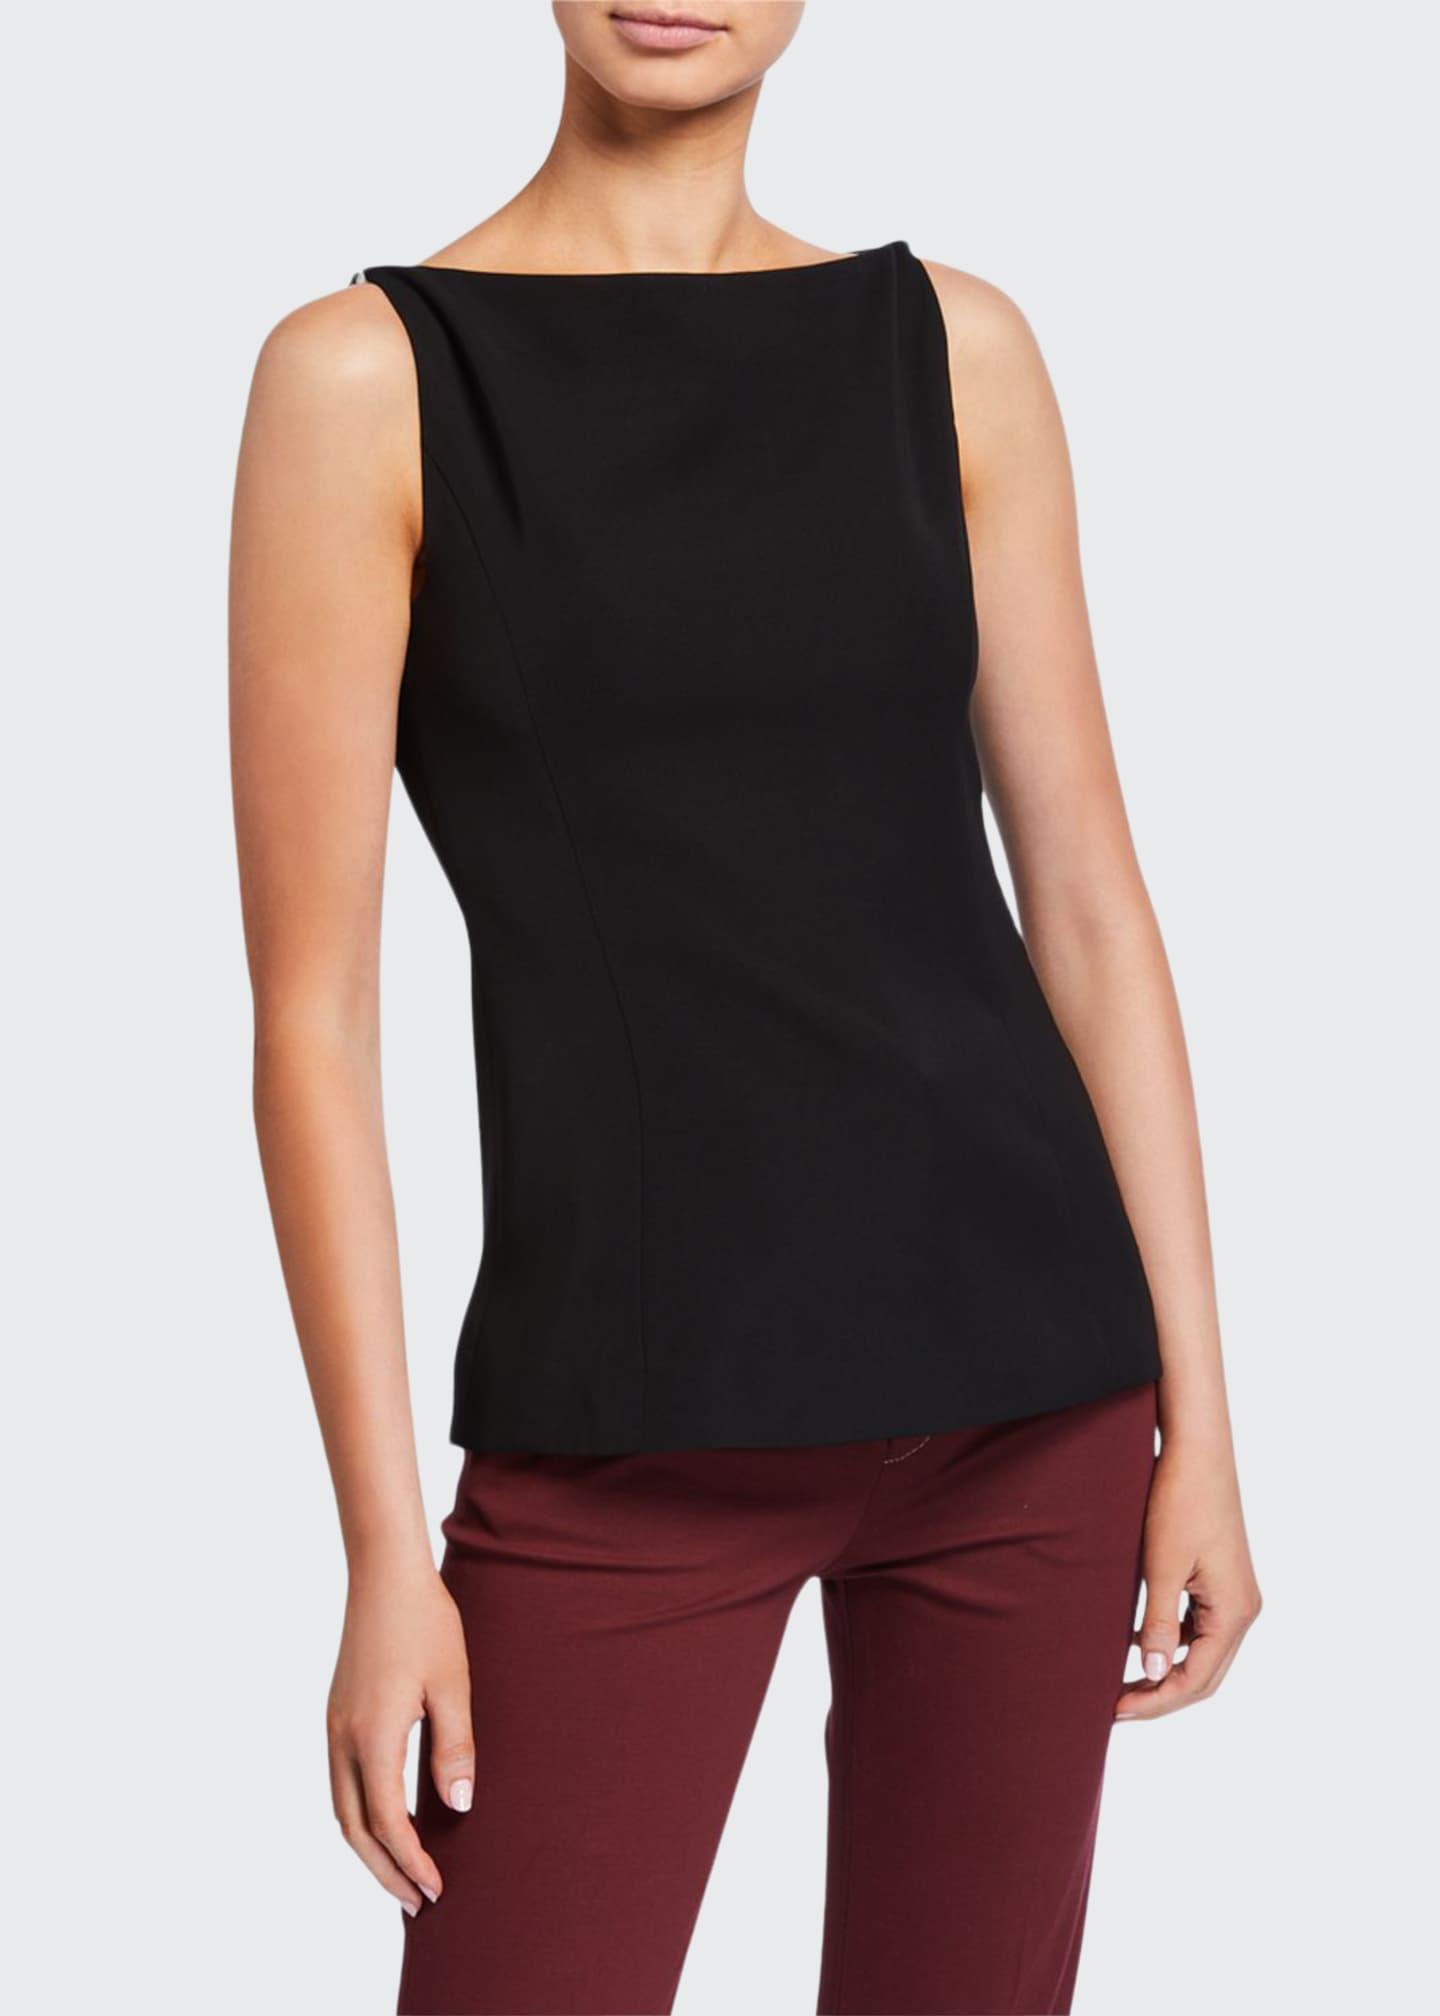 ADEAM Pearly-Shoulder Slip Top